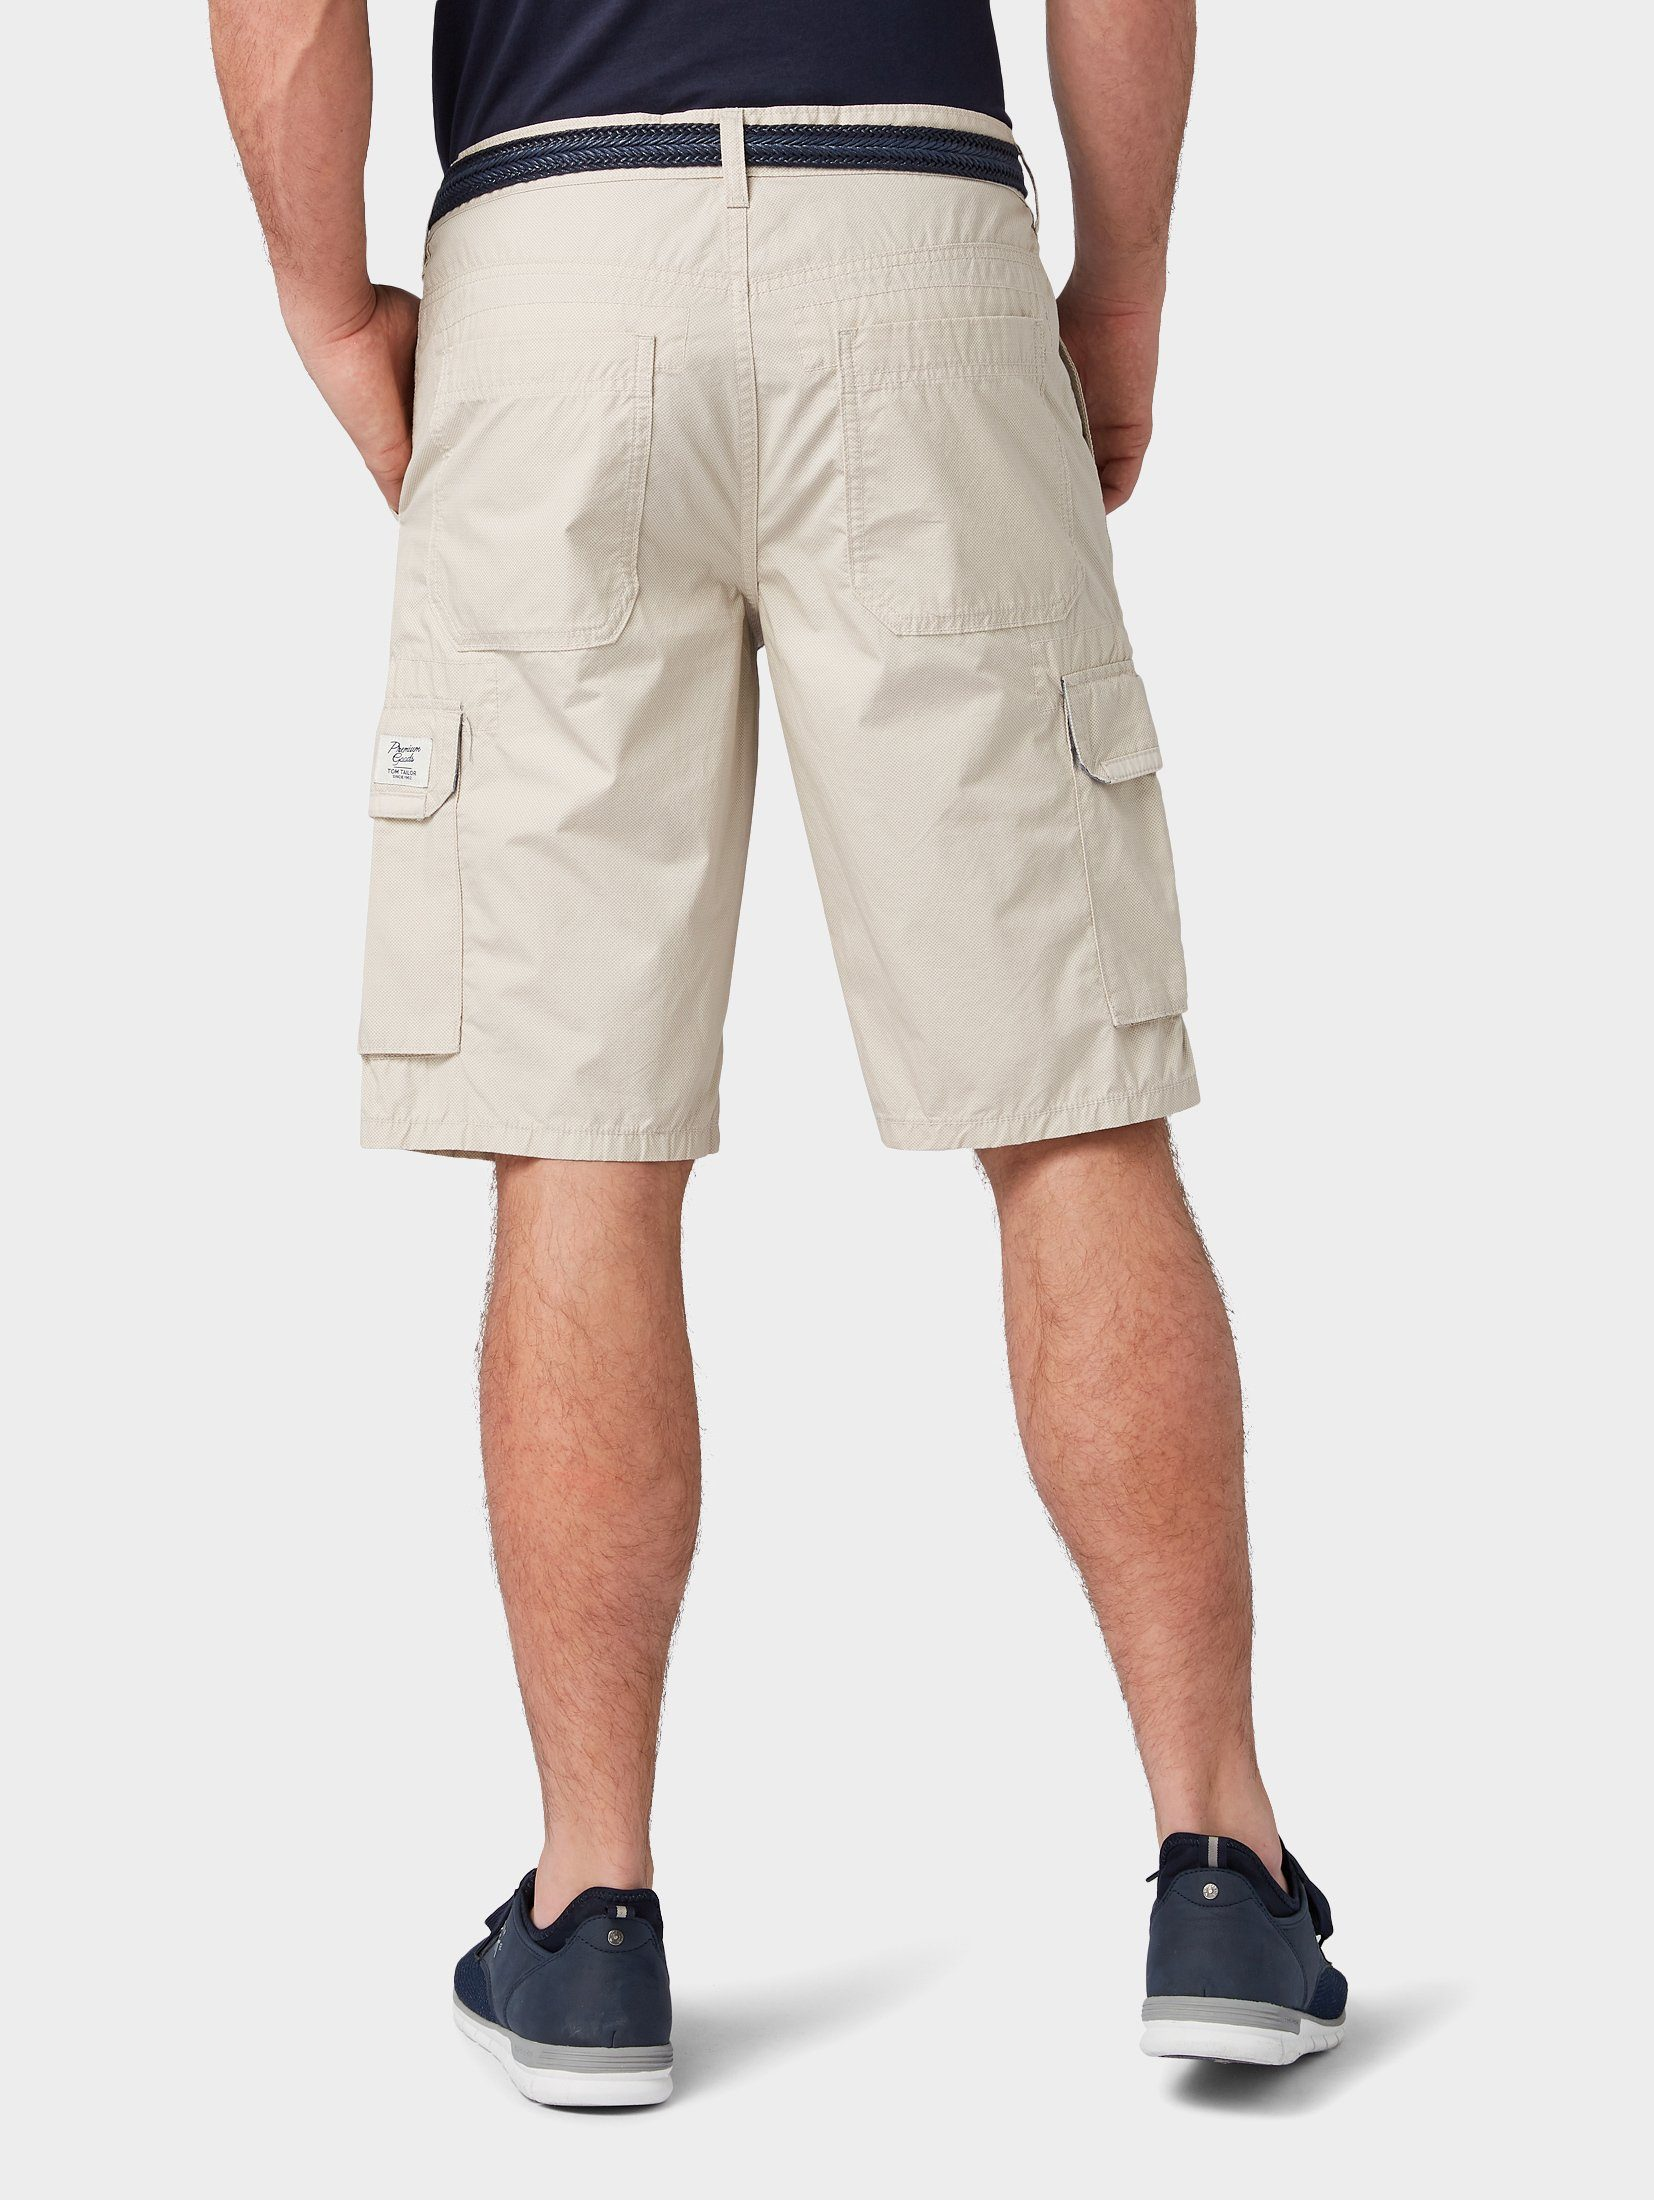 Shorts Tom Bermuda Shorts« »relaxed Morris Tailor wPXuTZOki